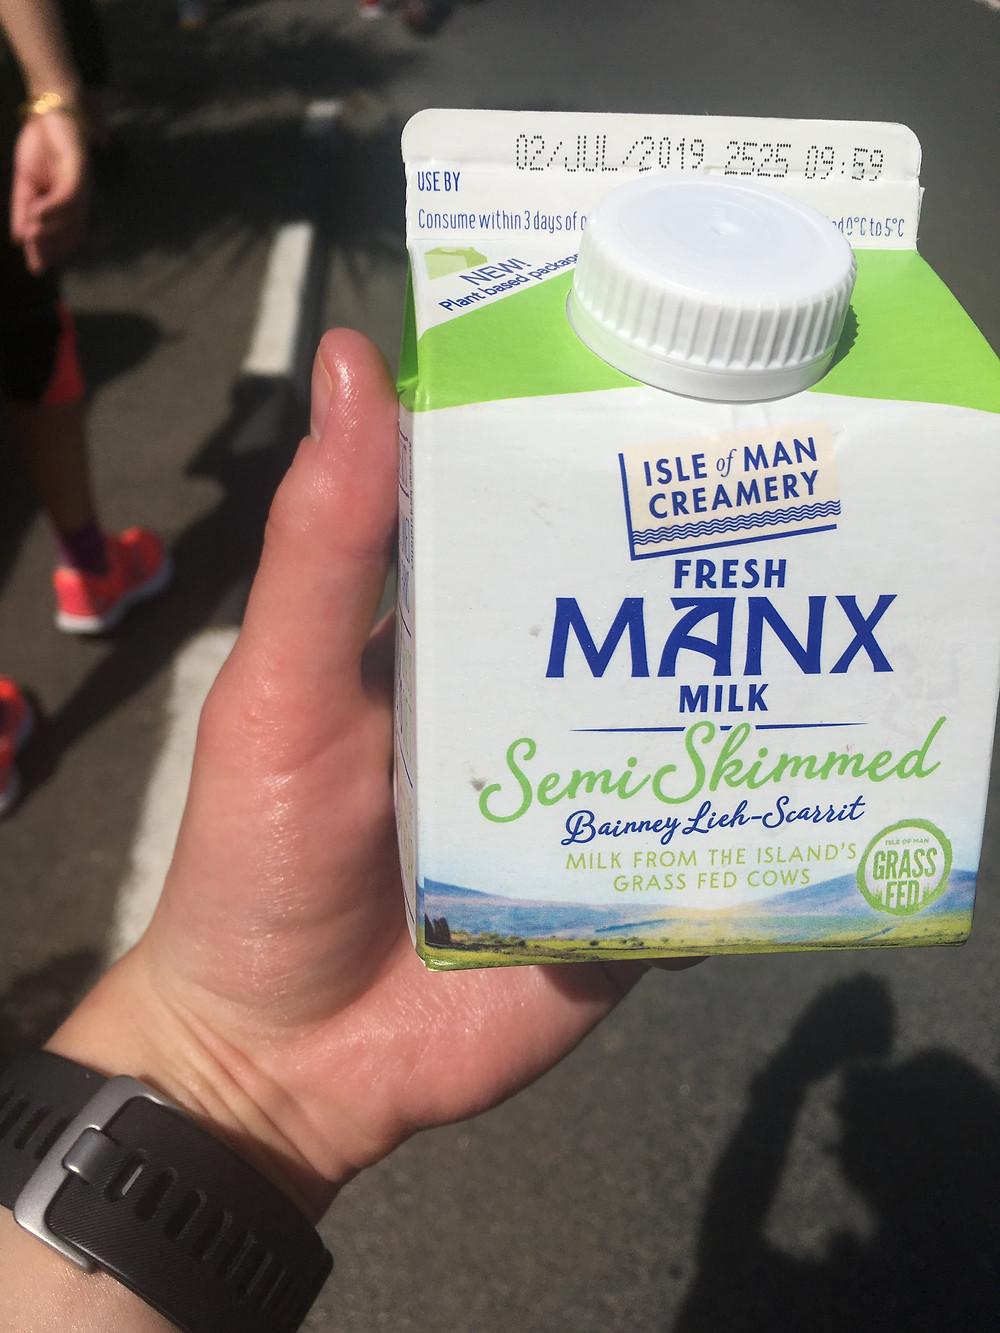 A carton of Manx milk